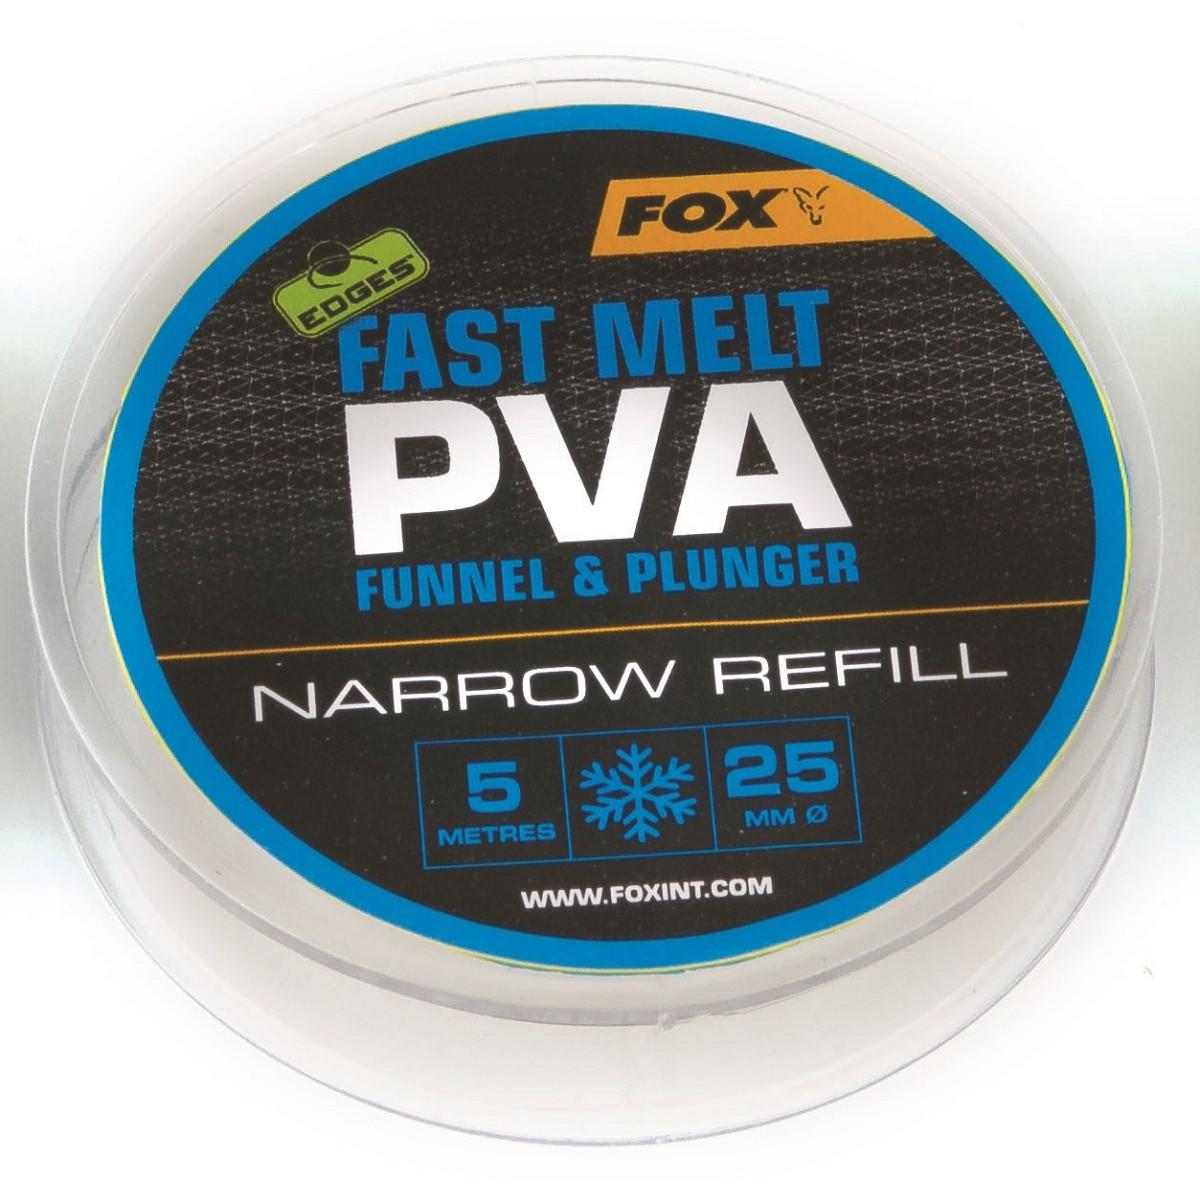 Fox Edges Fast Melt PVA Funnel & Plunger 25mm - PVA ръкав-ролка